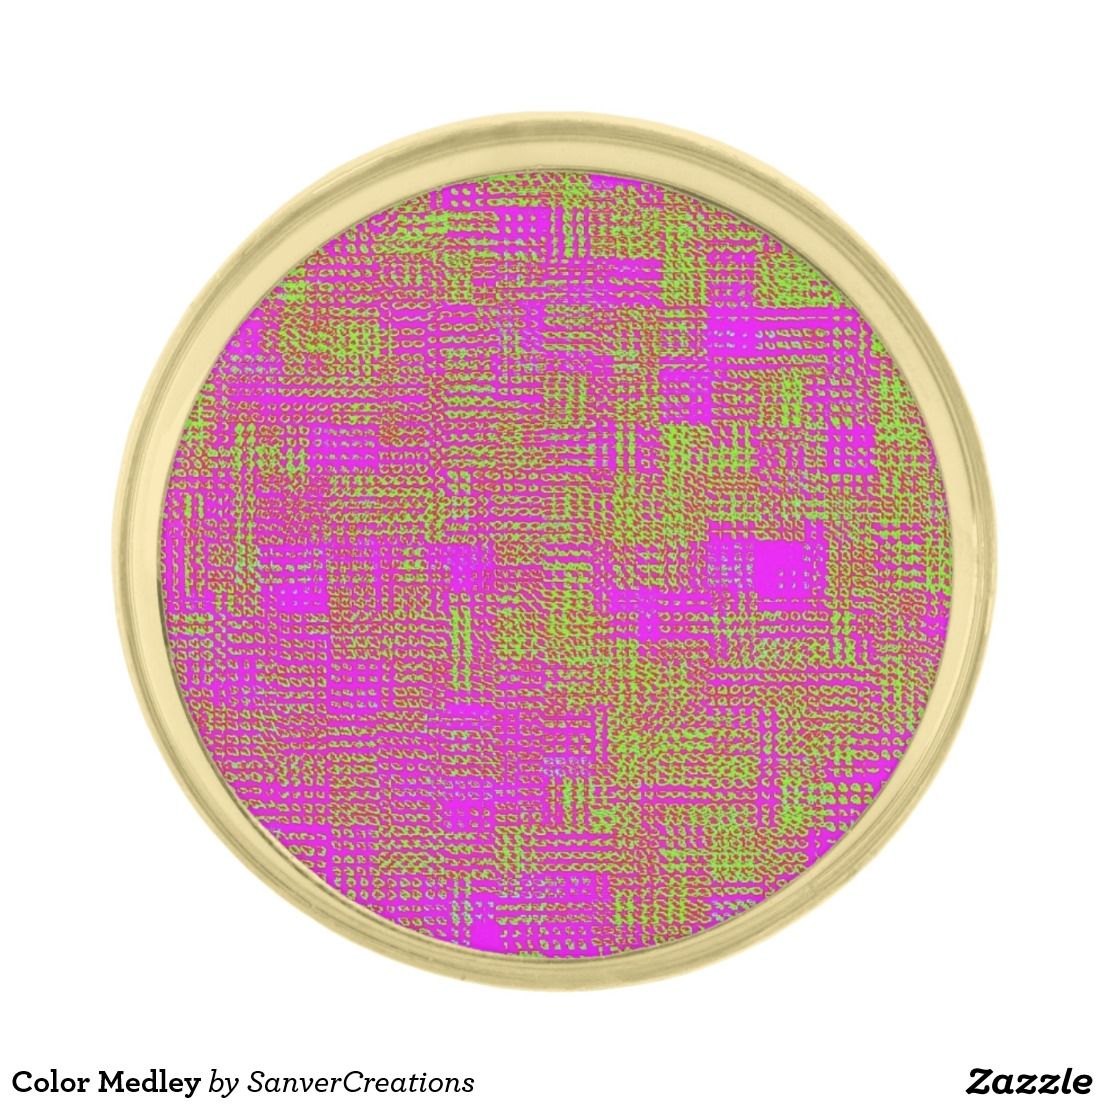 Color Medley Gold Finish Lapel Pin